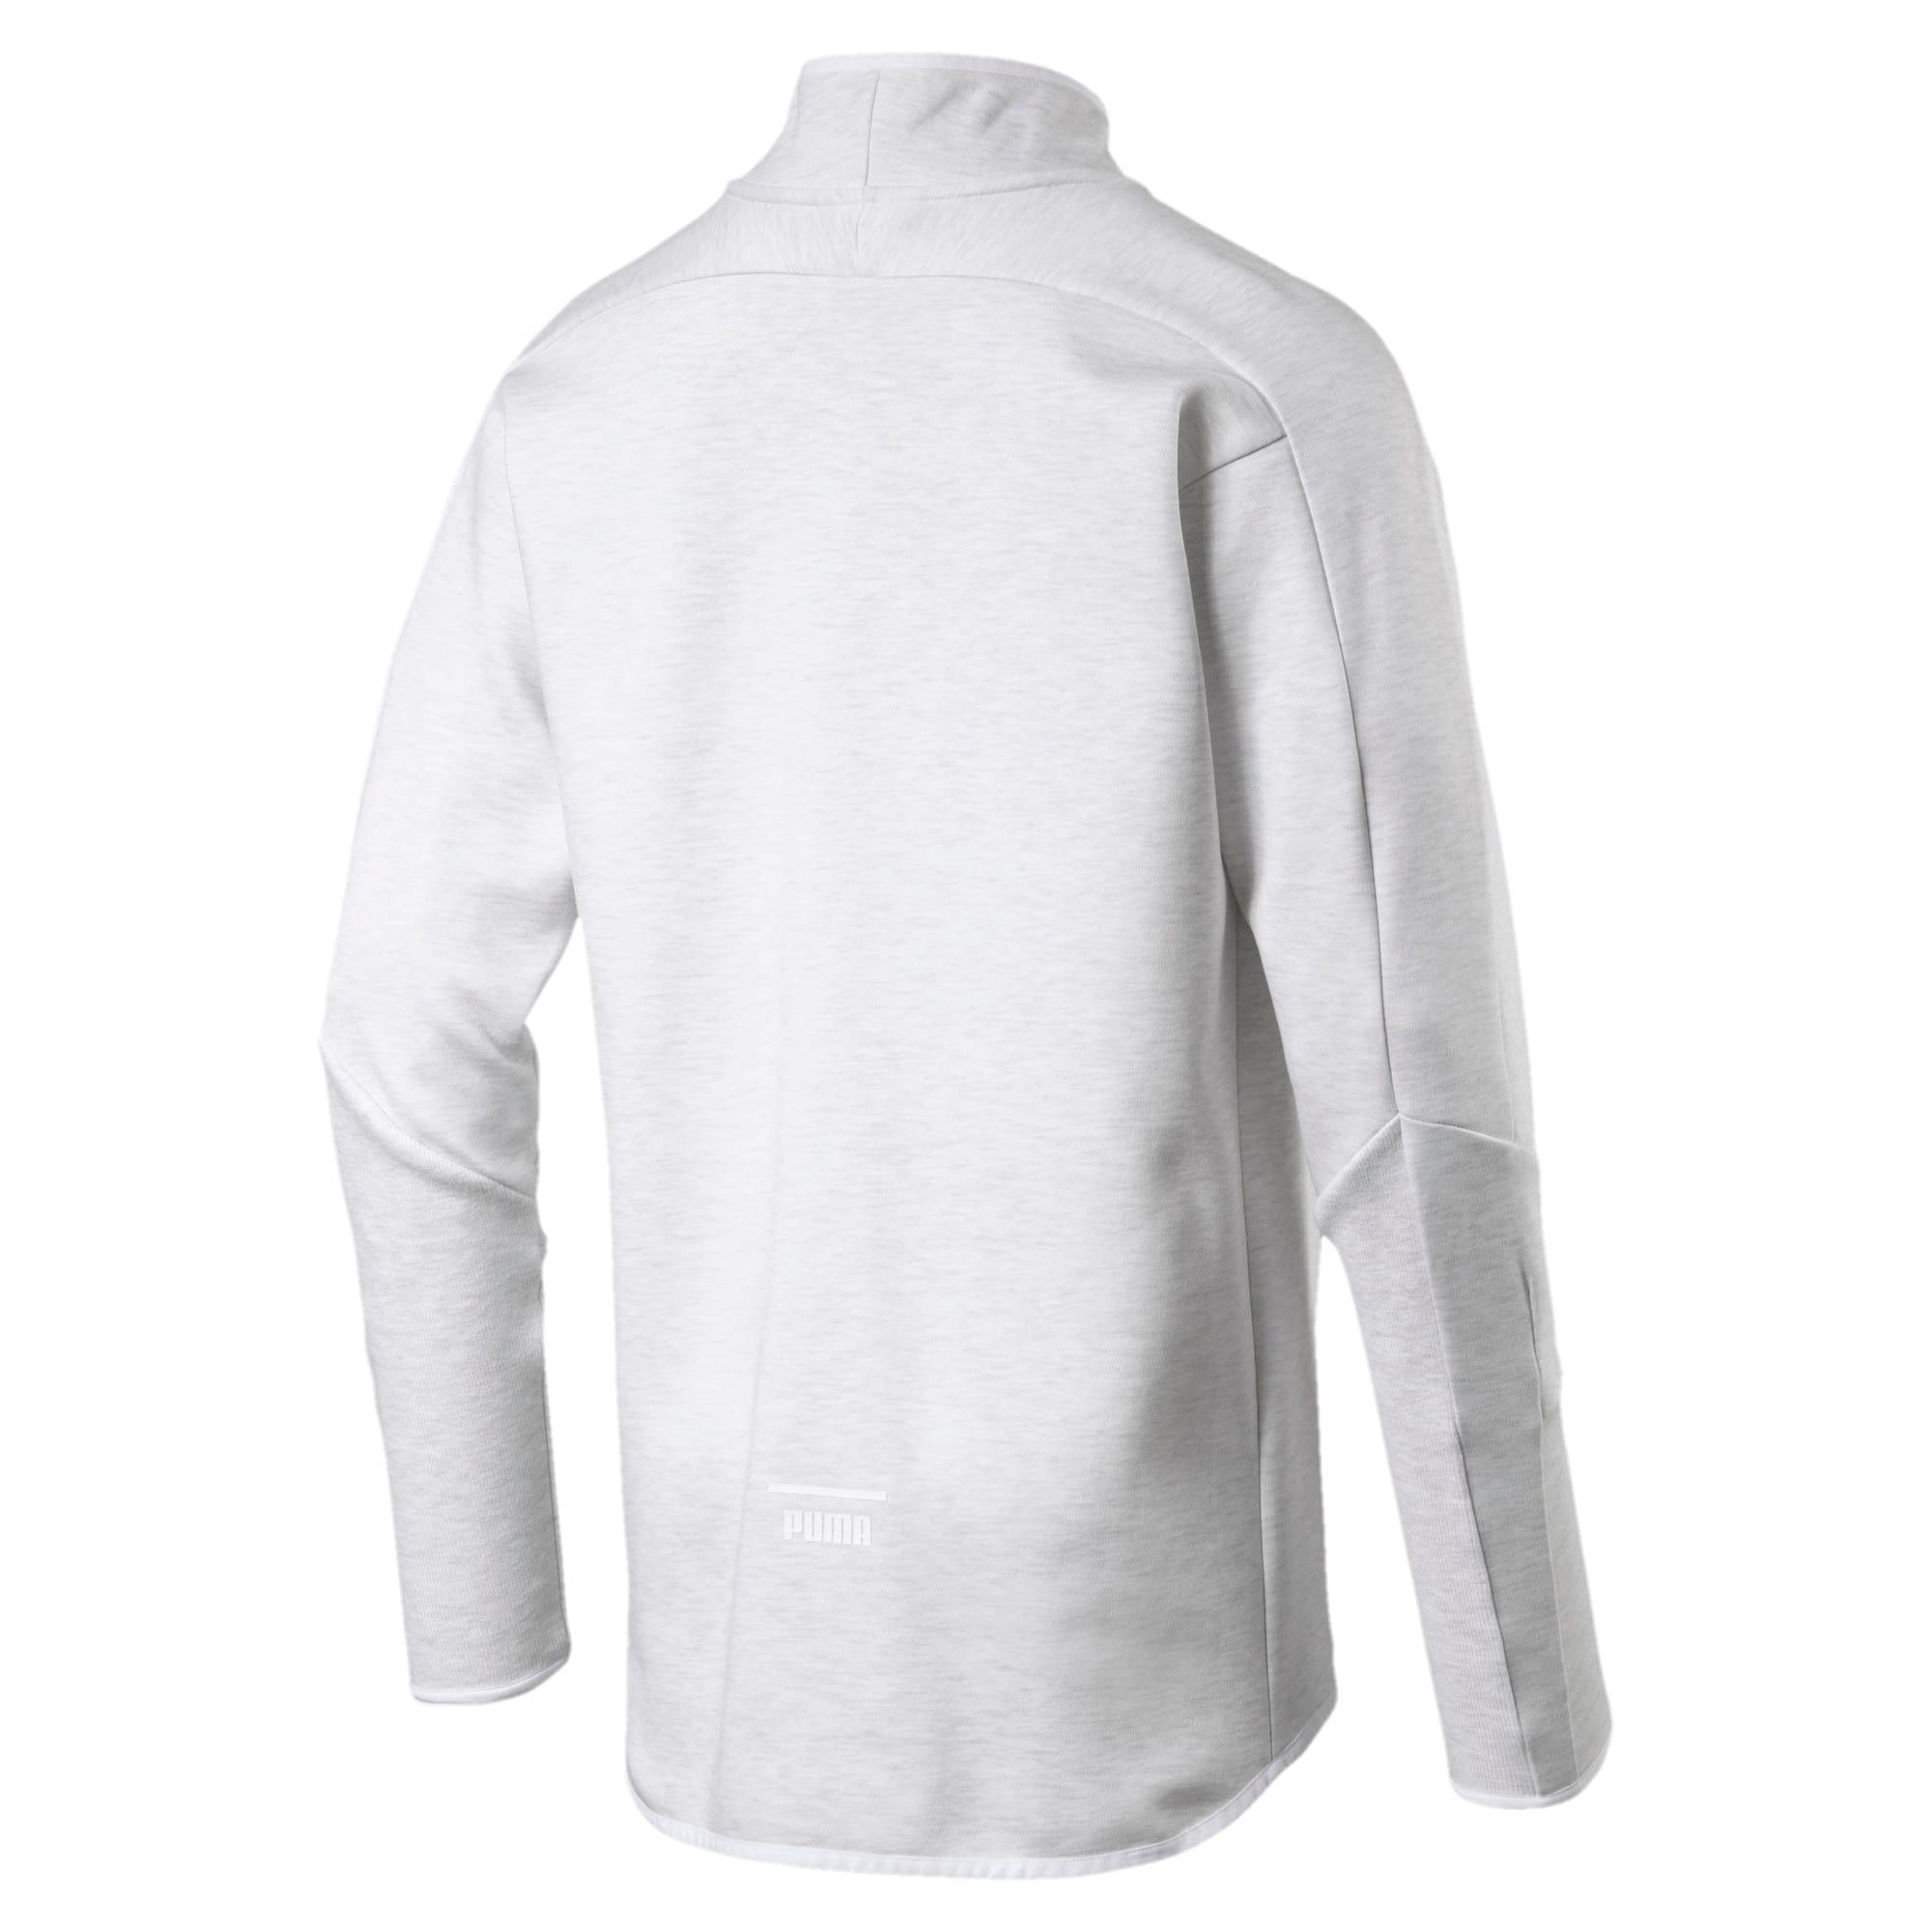 Pace Primary Savannah Men's Half Zip Sweatshirt